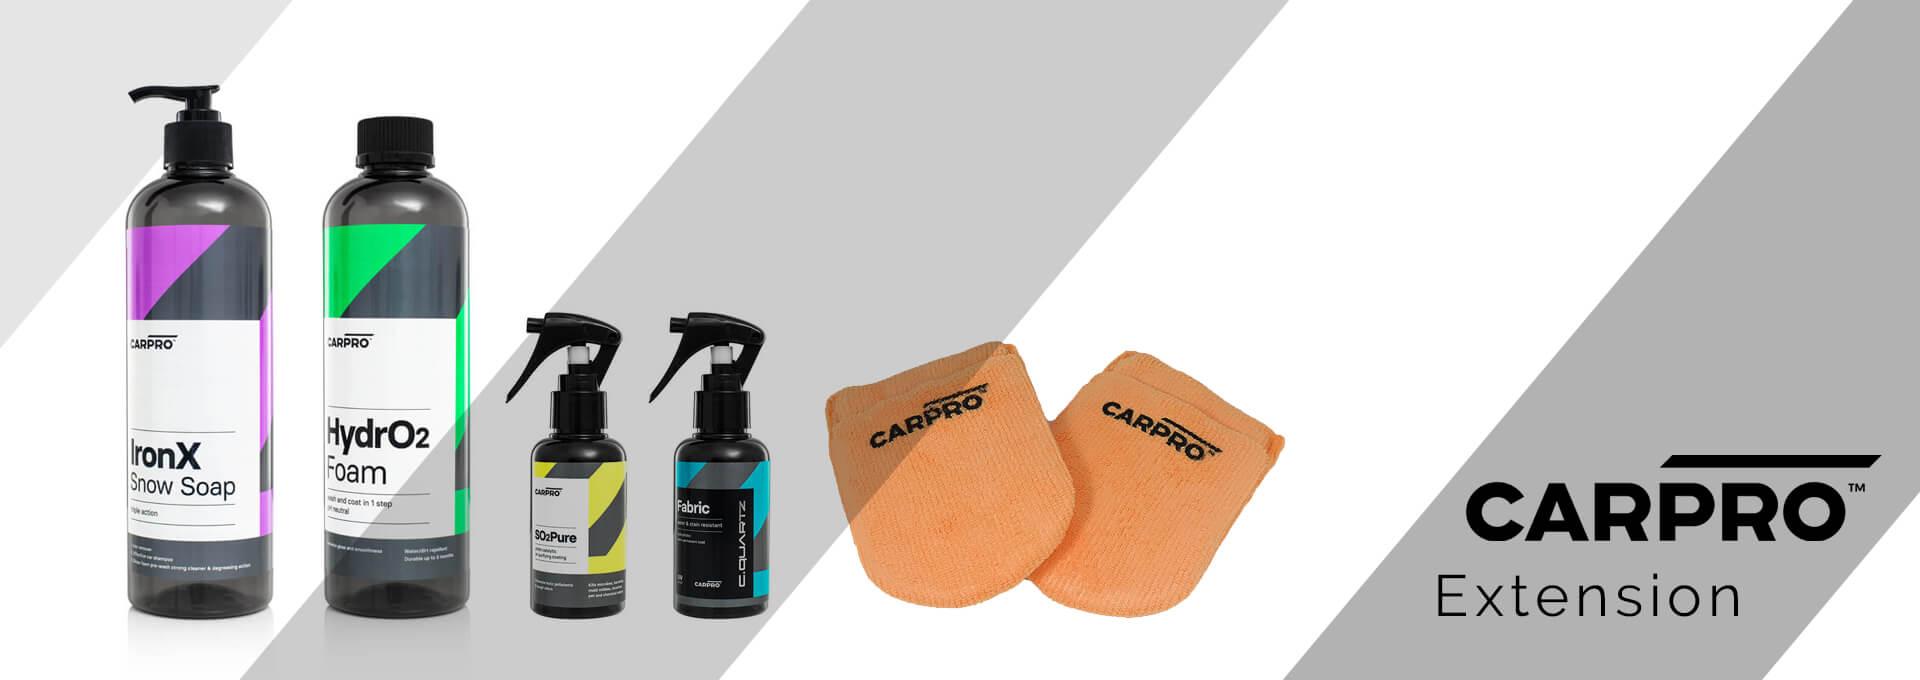 CarPro - Product Range Extension